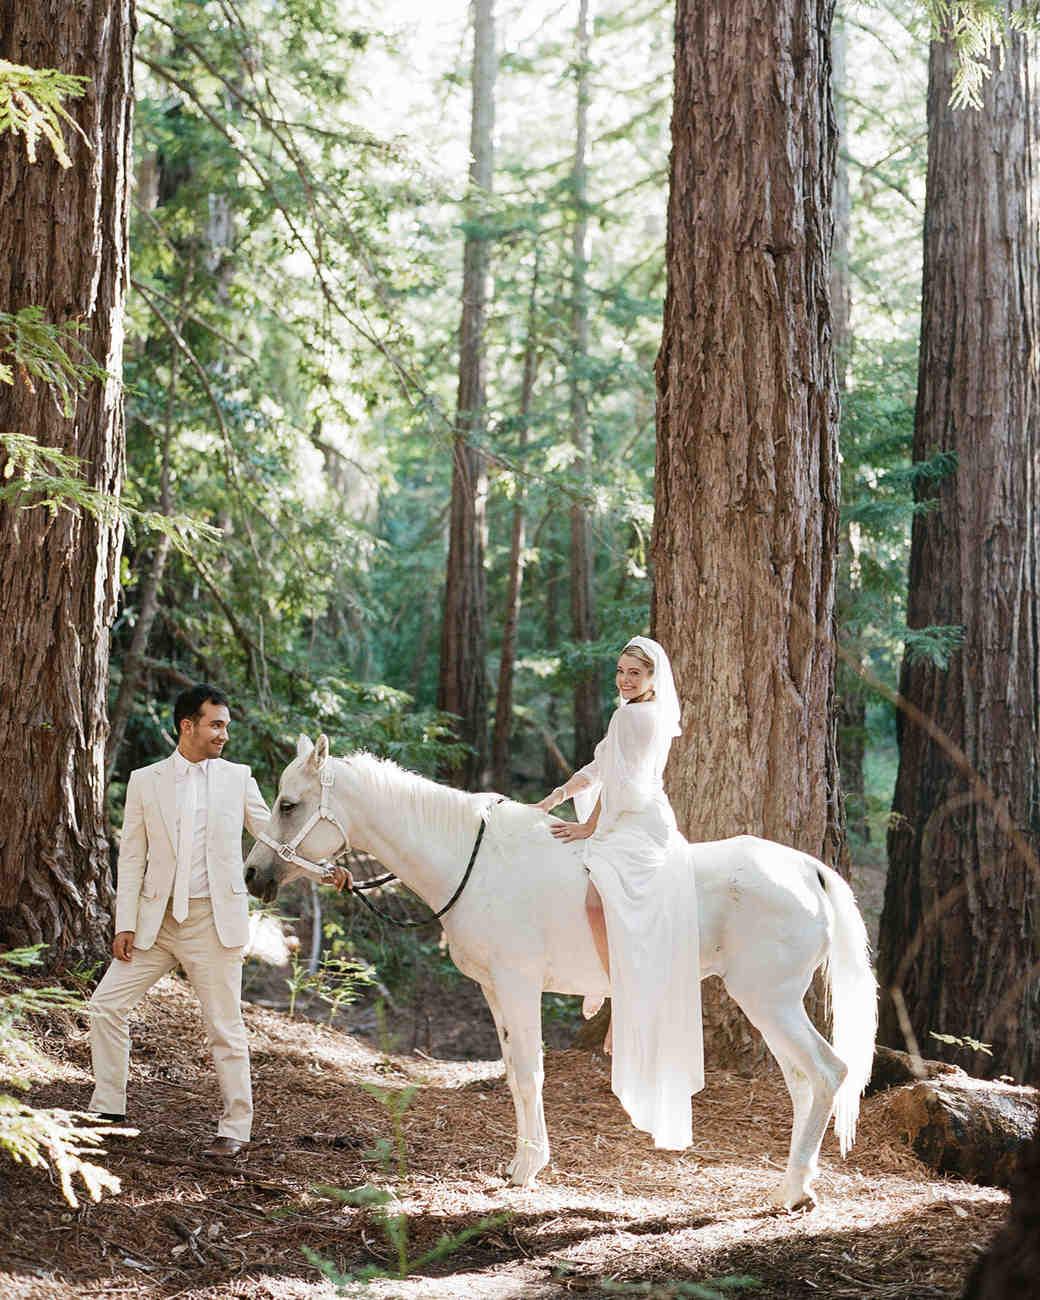 breelayne-hunter-wedding-california-0061-barn-santa-lucia-preserve-horse-s112849.jpg